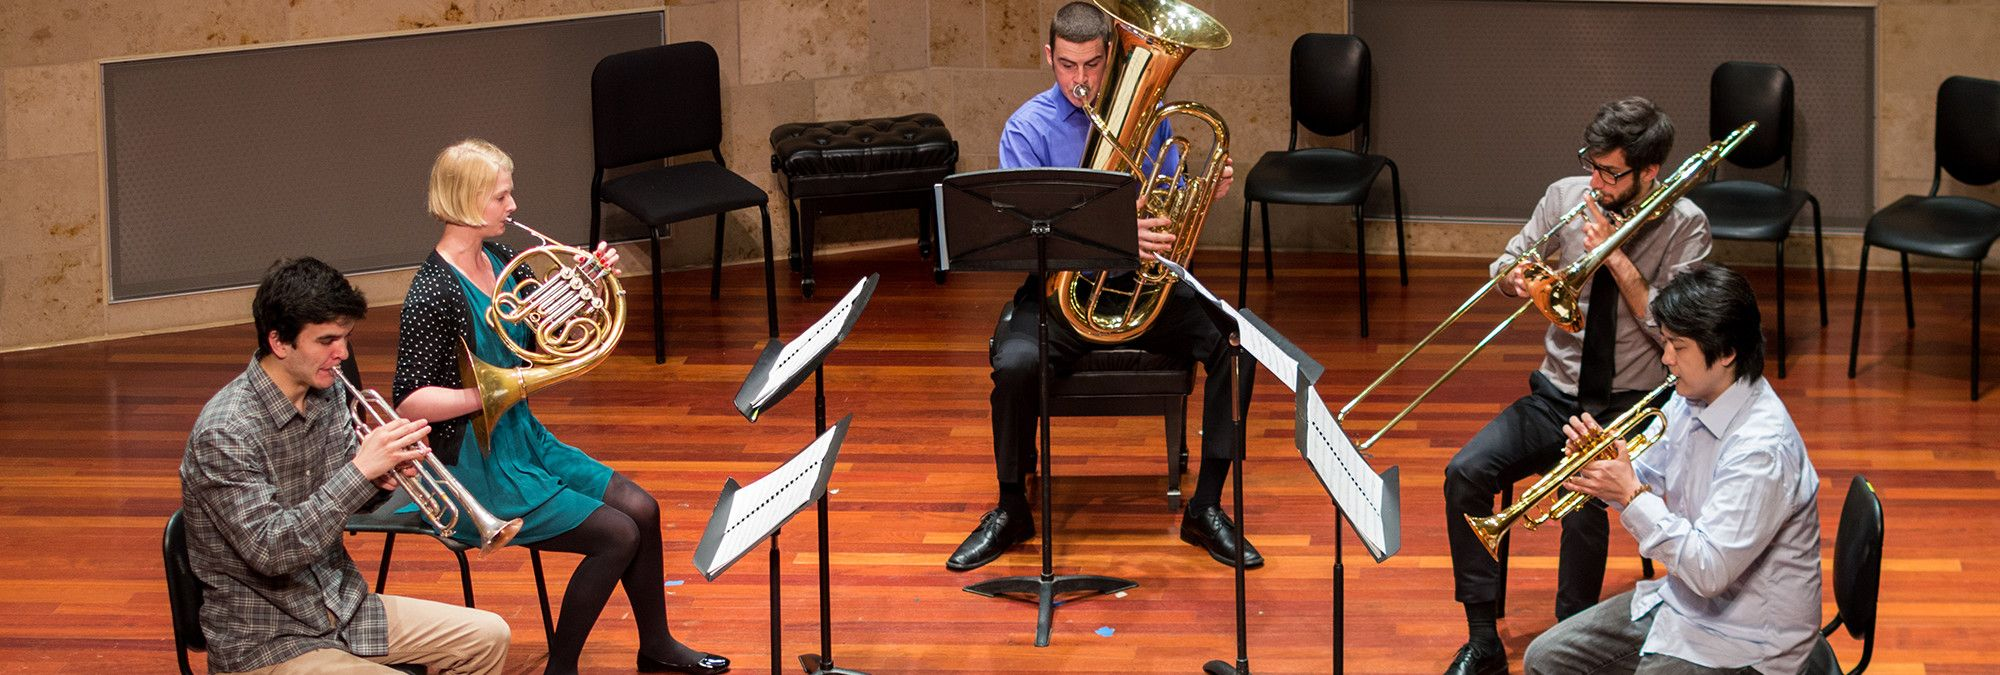 Brass Chamber Music in SFCM